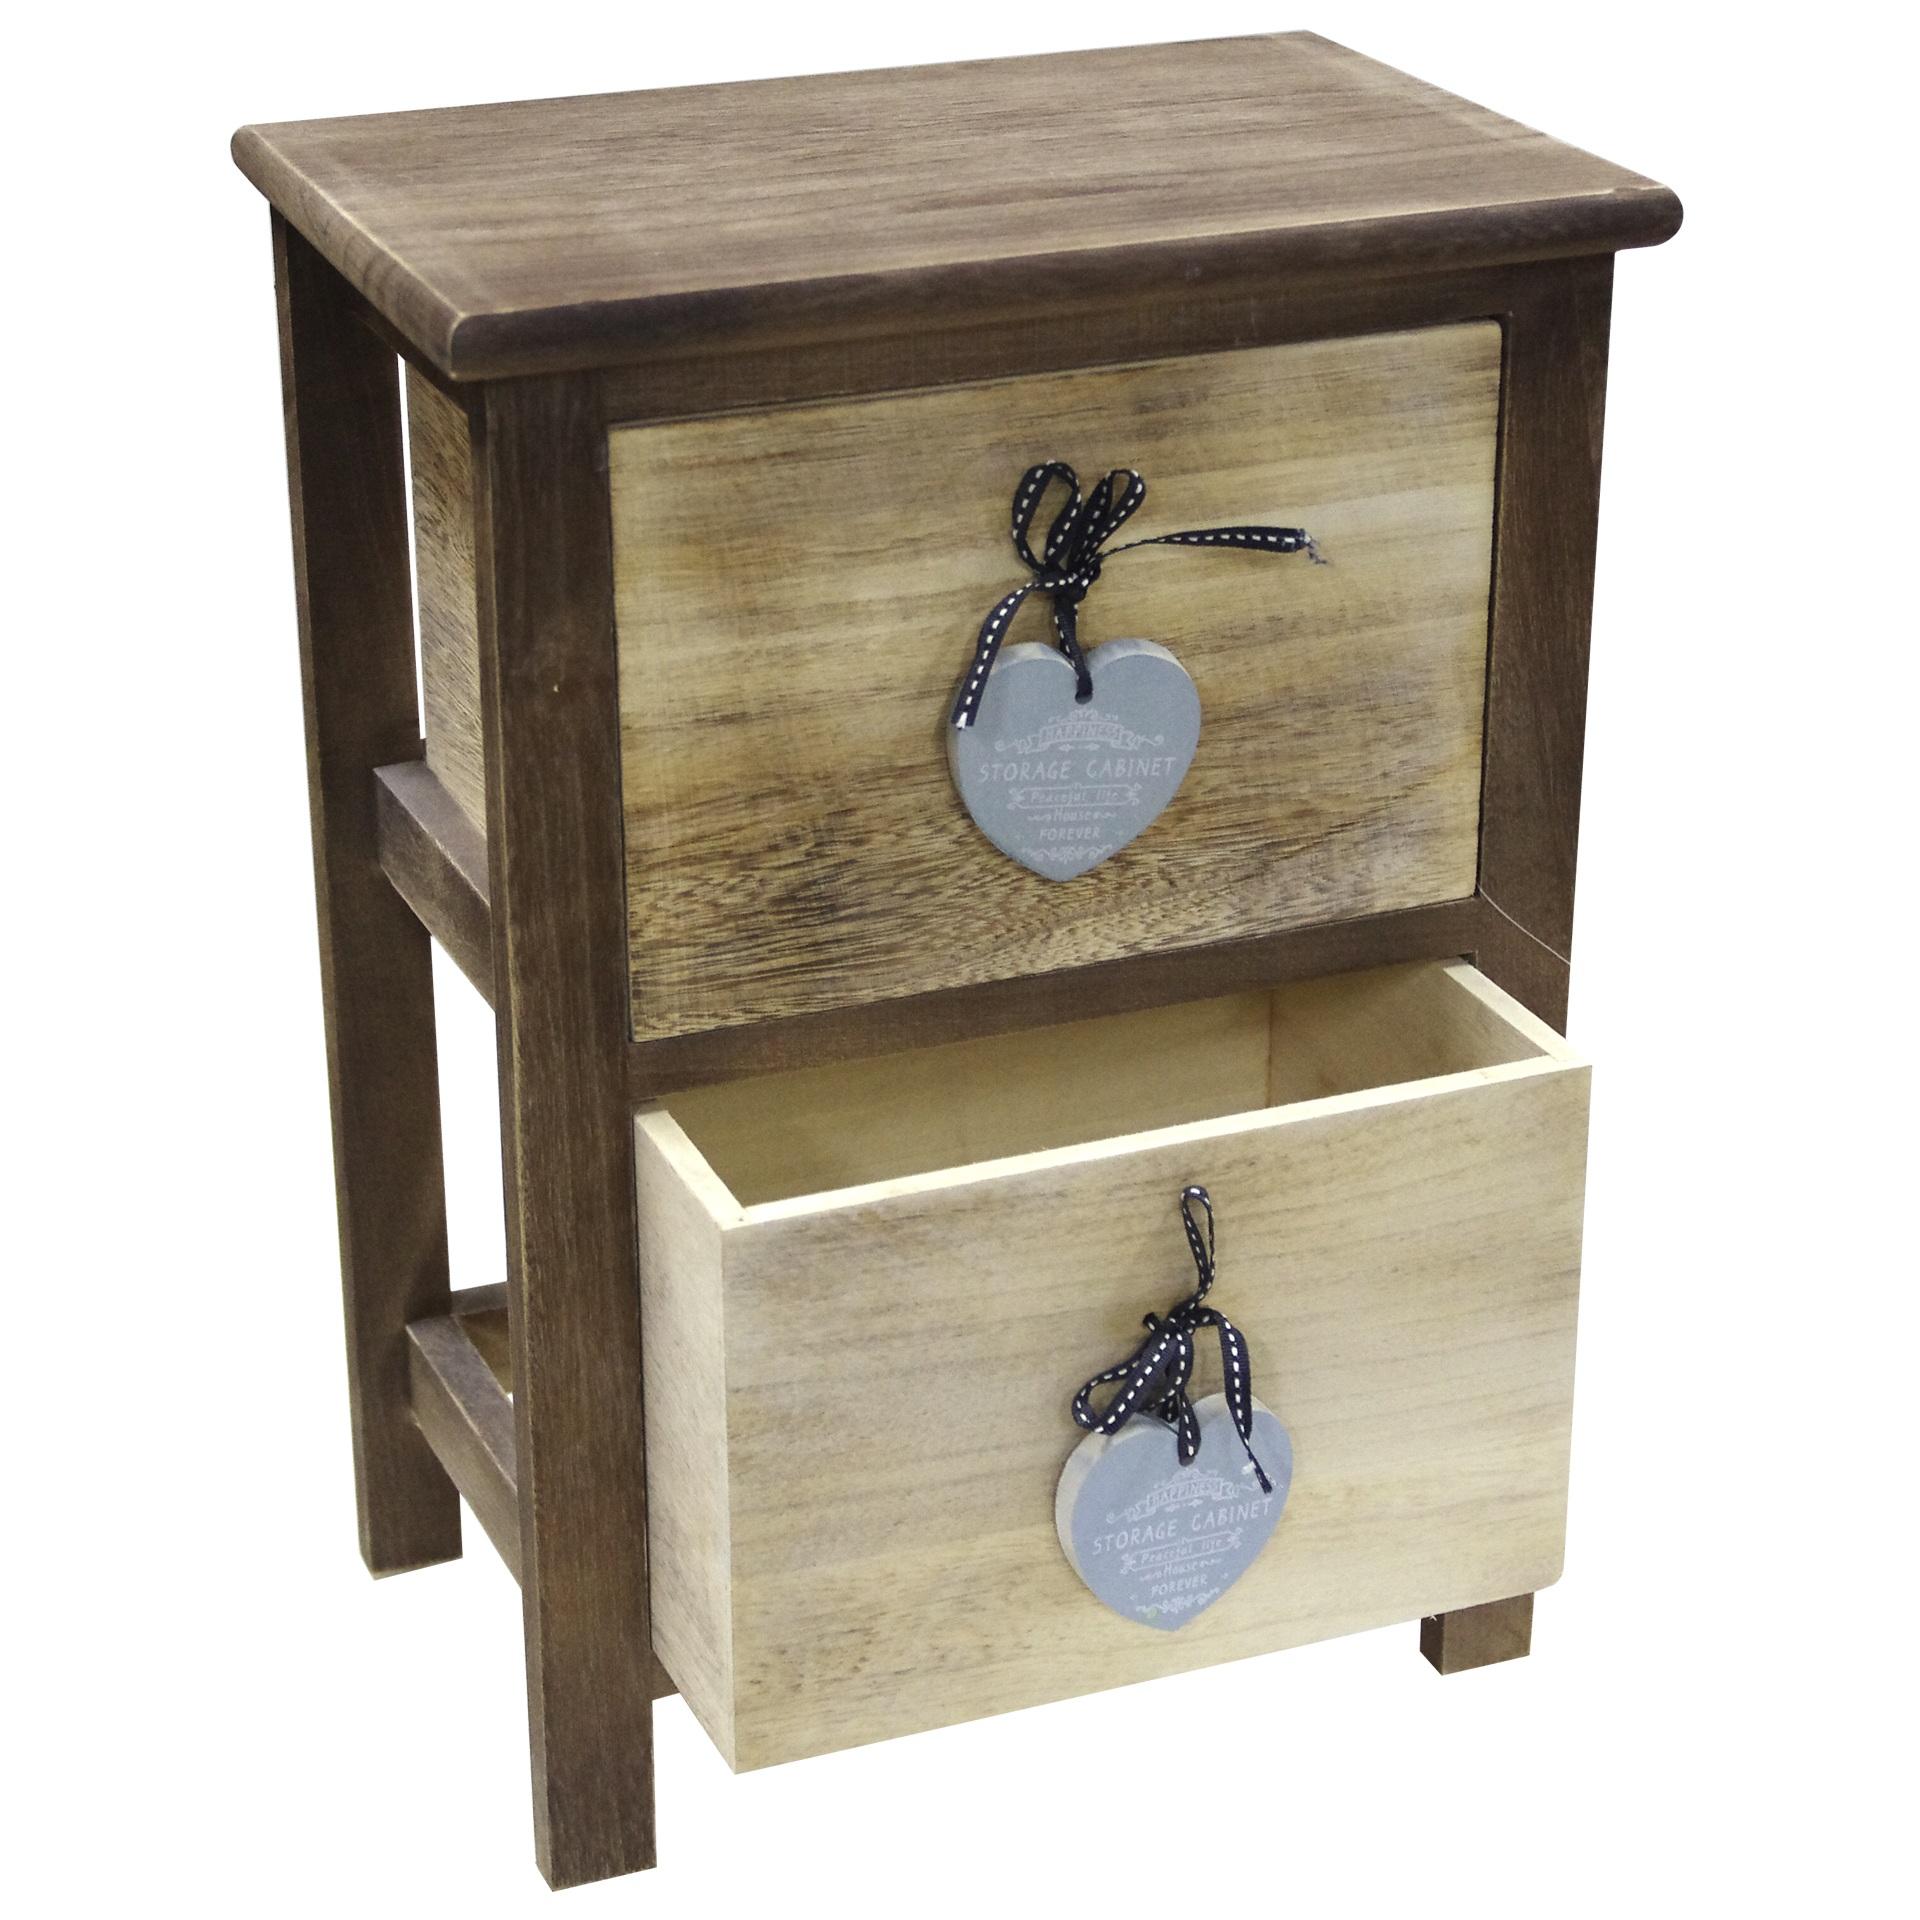 Fotos gratis : madera, decoración, estante, mesa para cambiar ...